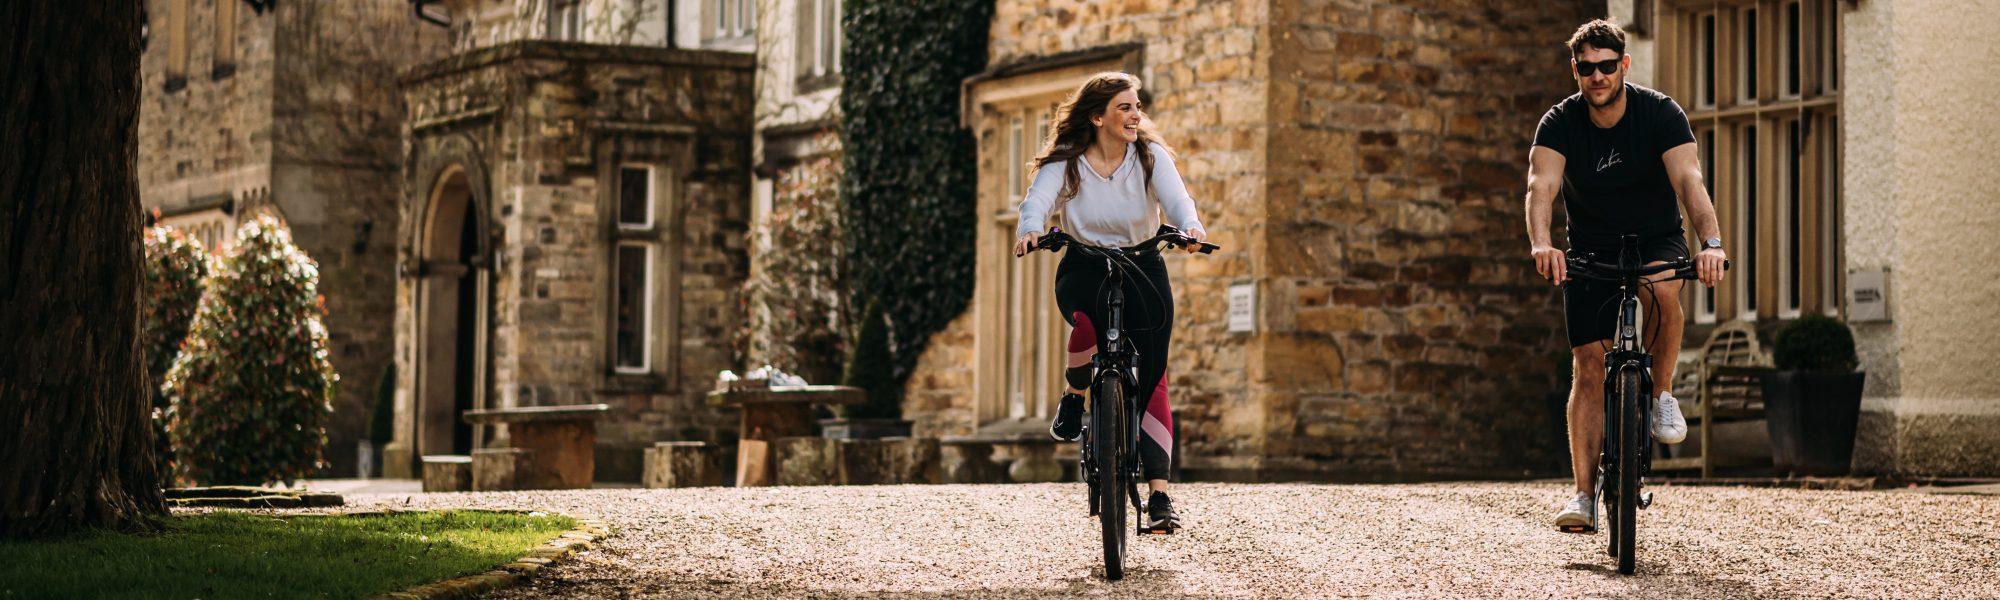 Explore Bowland by E-bike